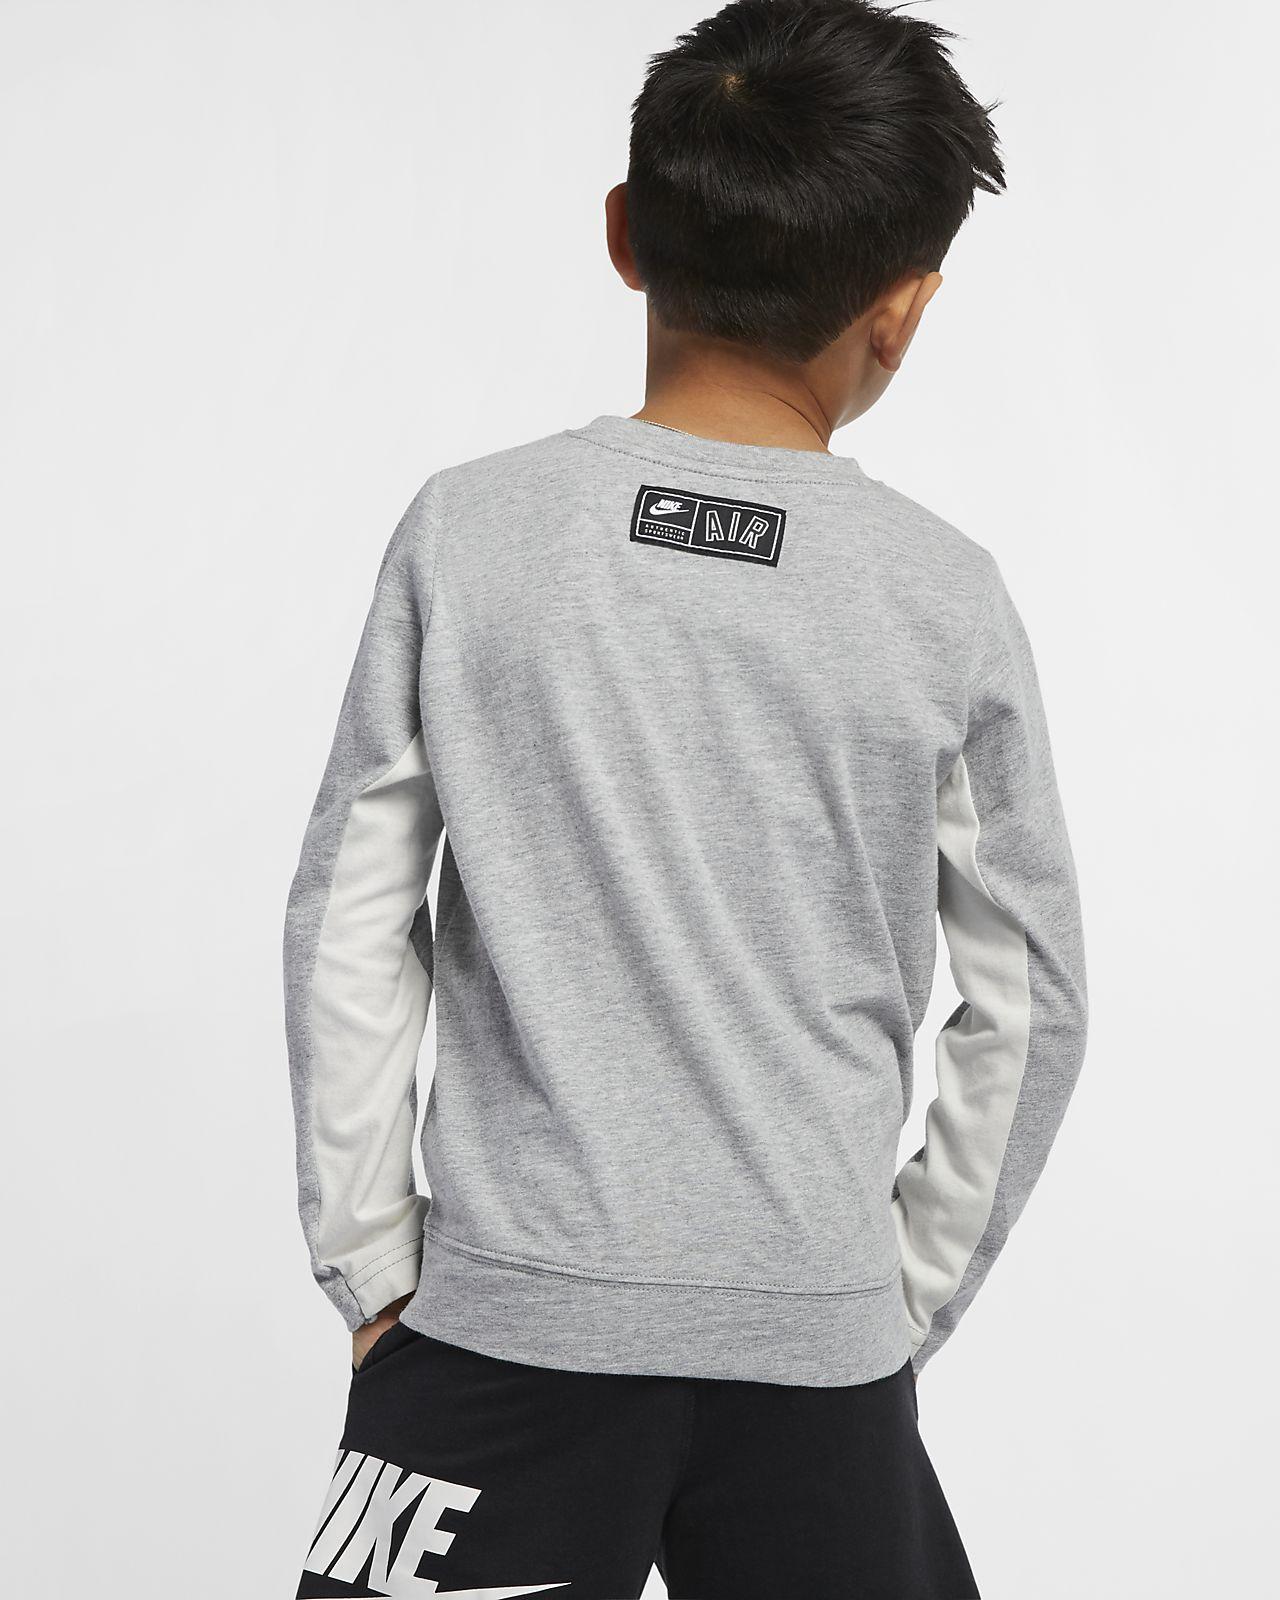 9b3eec12 Nike Air Younger Kids' Long-Sleeve Top. Nike.com GB